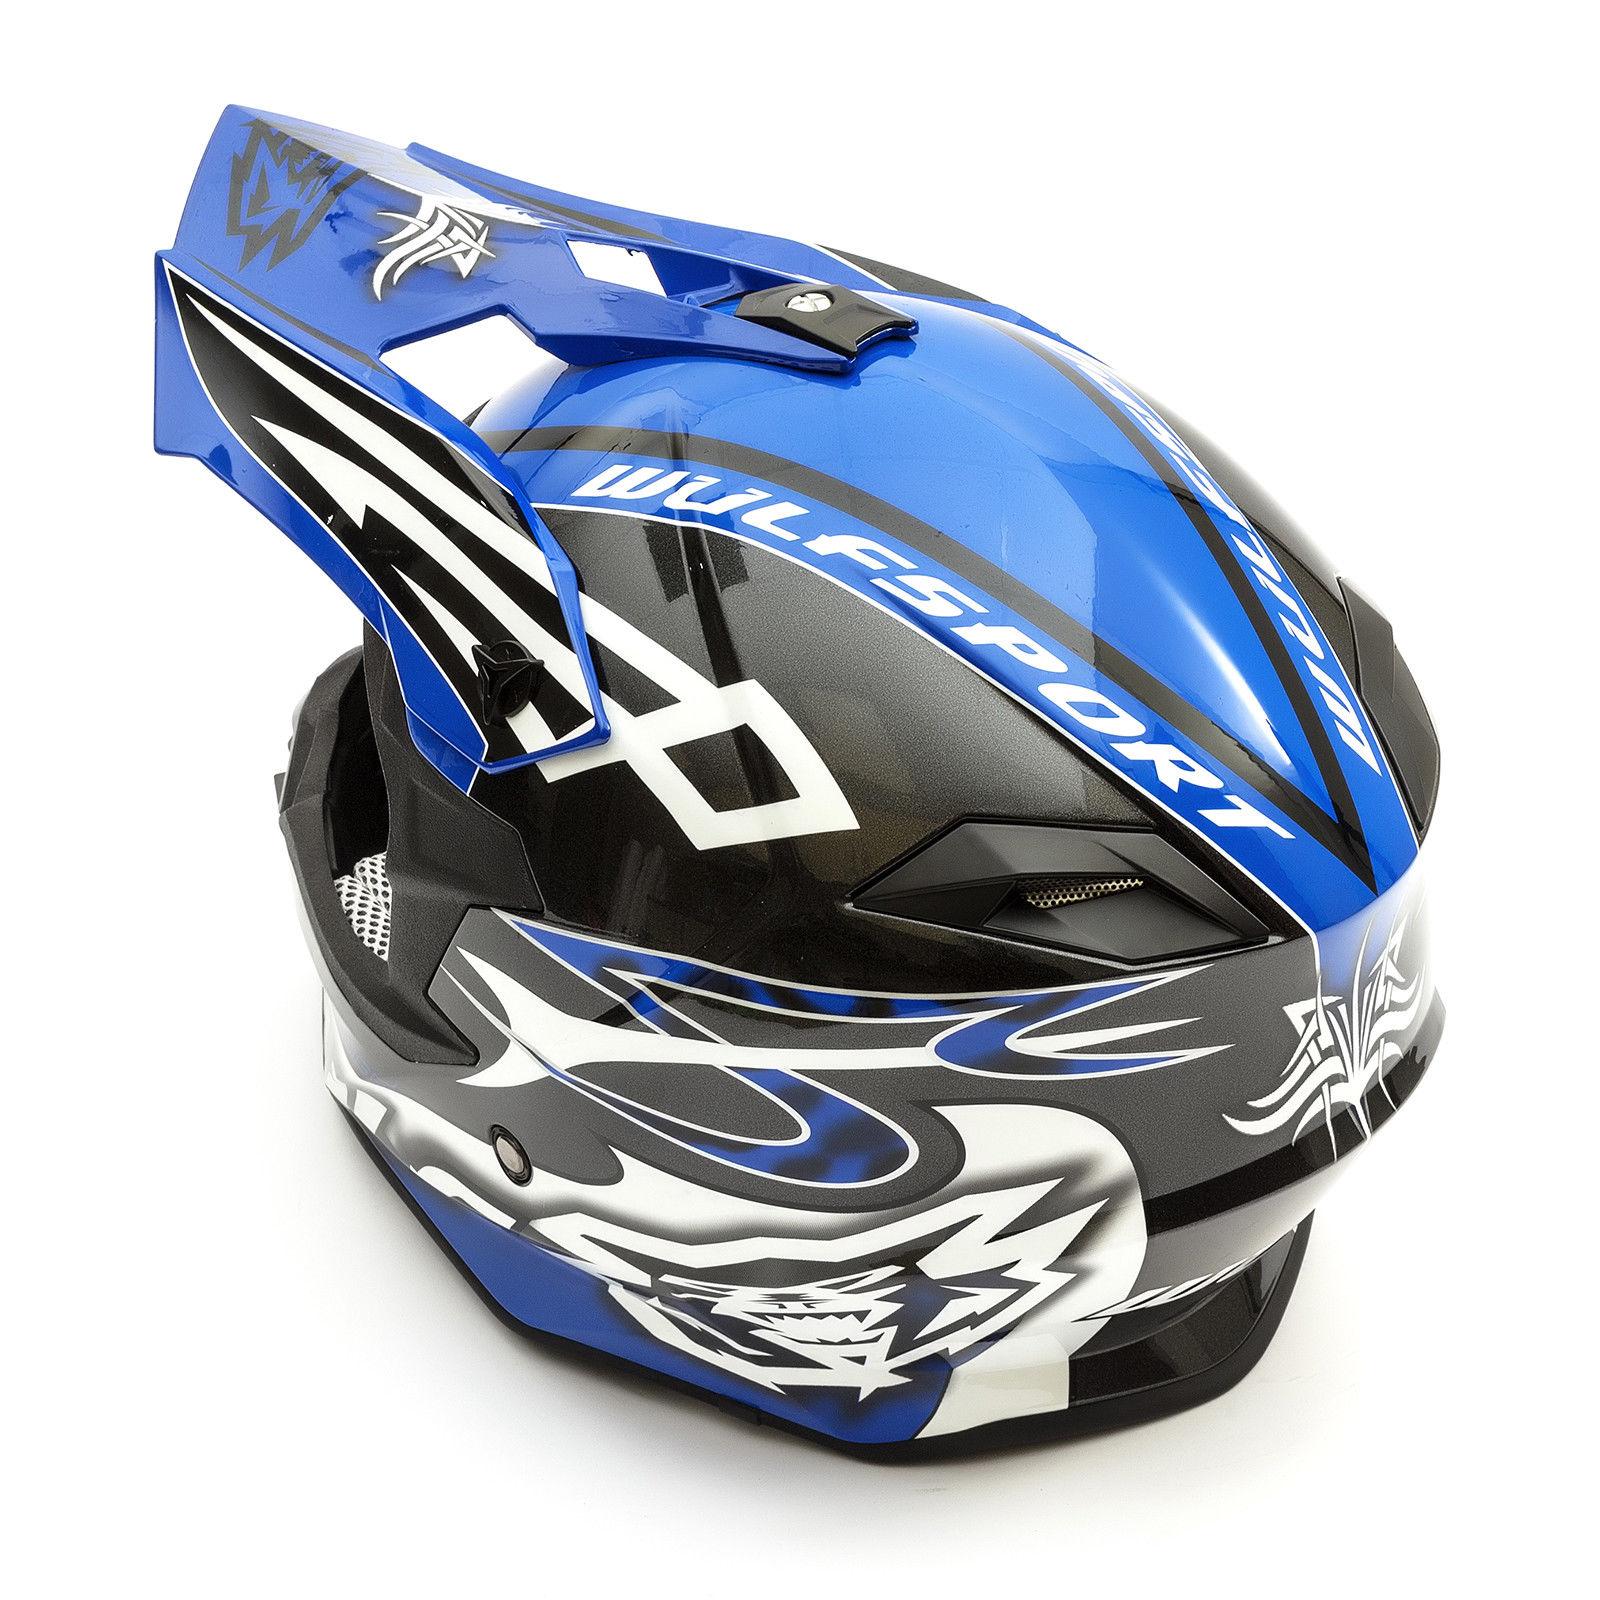 Wulfsport-Adult-Sceptre-Helmets-Motocross-Pitbike-Motorbike-Off-Road-Racing-ATV thumbnail 17